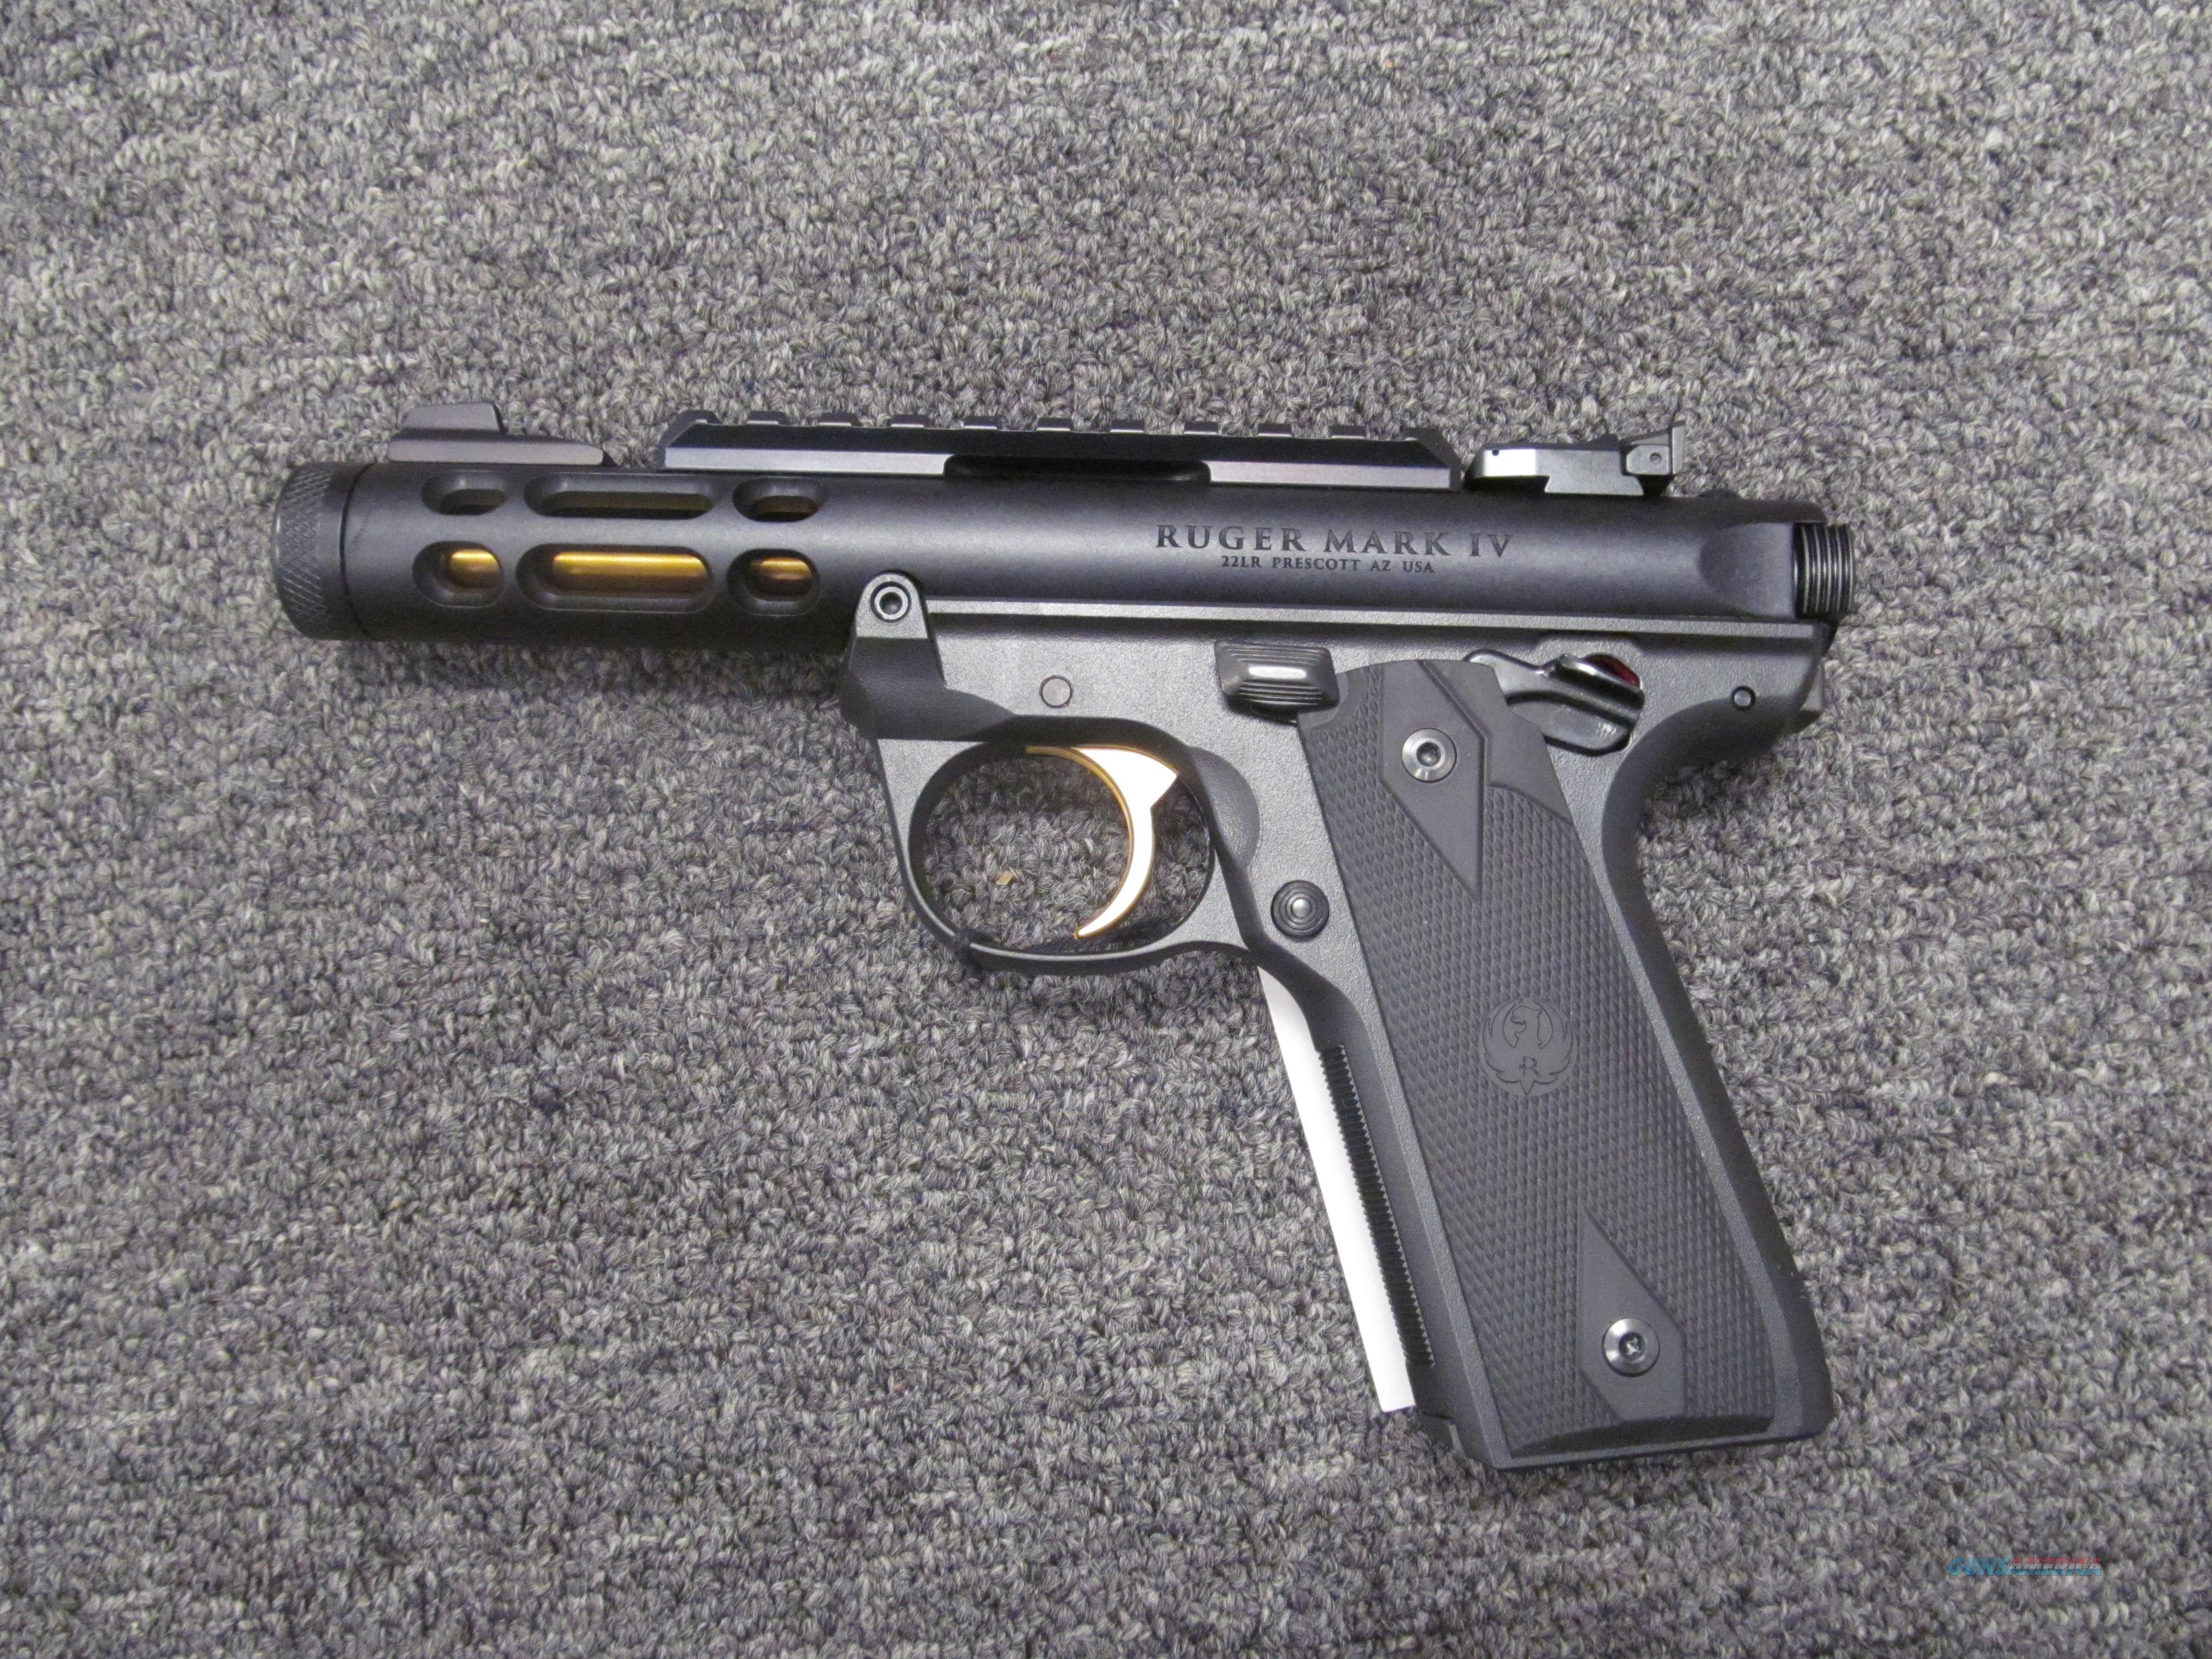 Ruger 22/45 Mark IV  Guns > Pistols > Ruger Semi-Auto Pistols > Mark I/II/III/IV Family